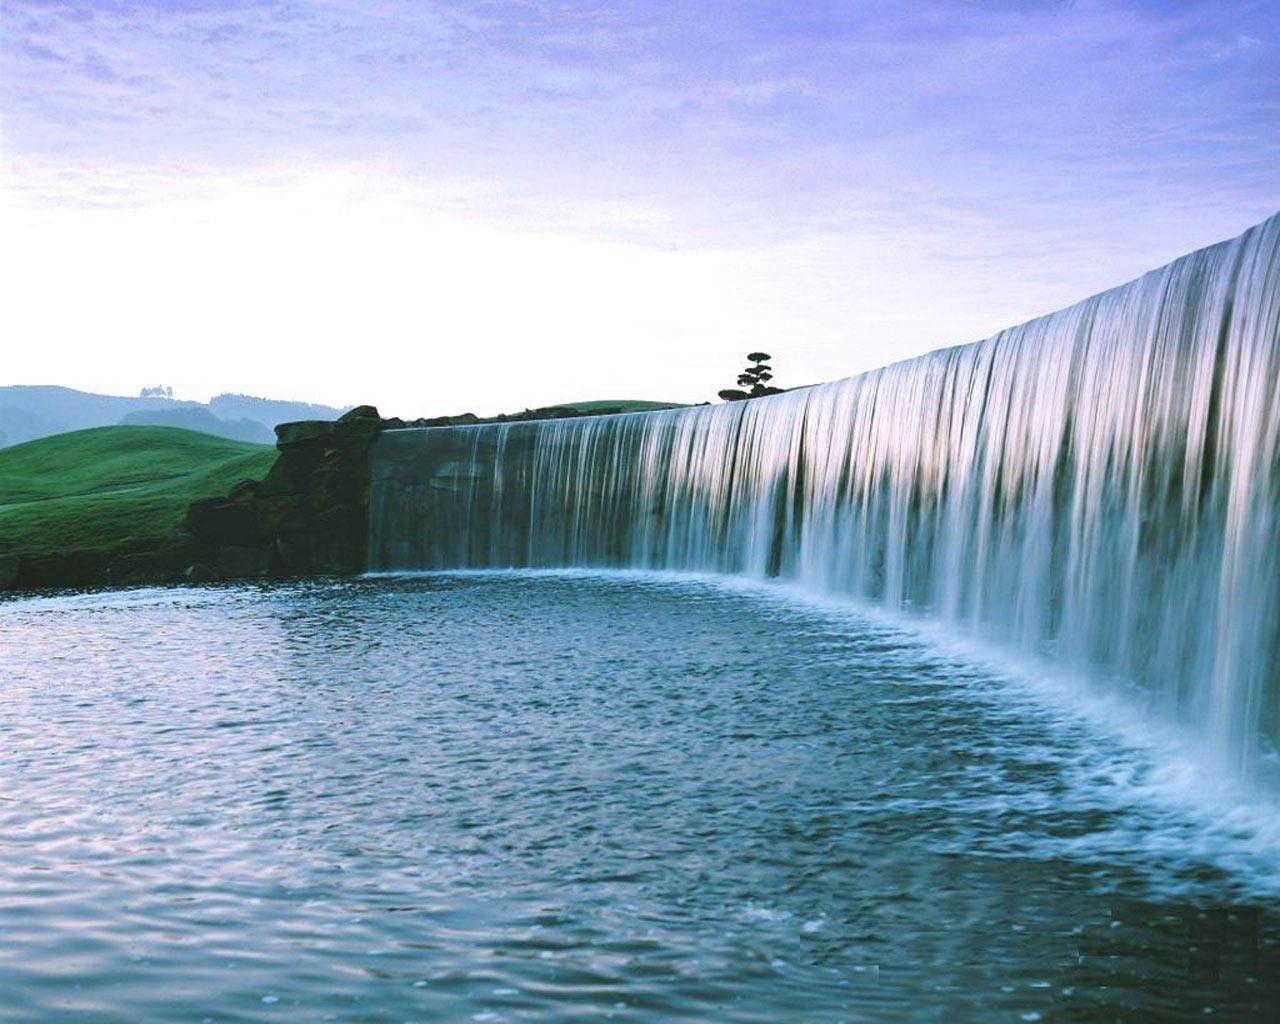 Wall2U Best Waterfall Wallpaper Pack For Best Laptop